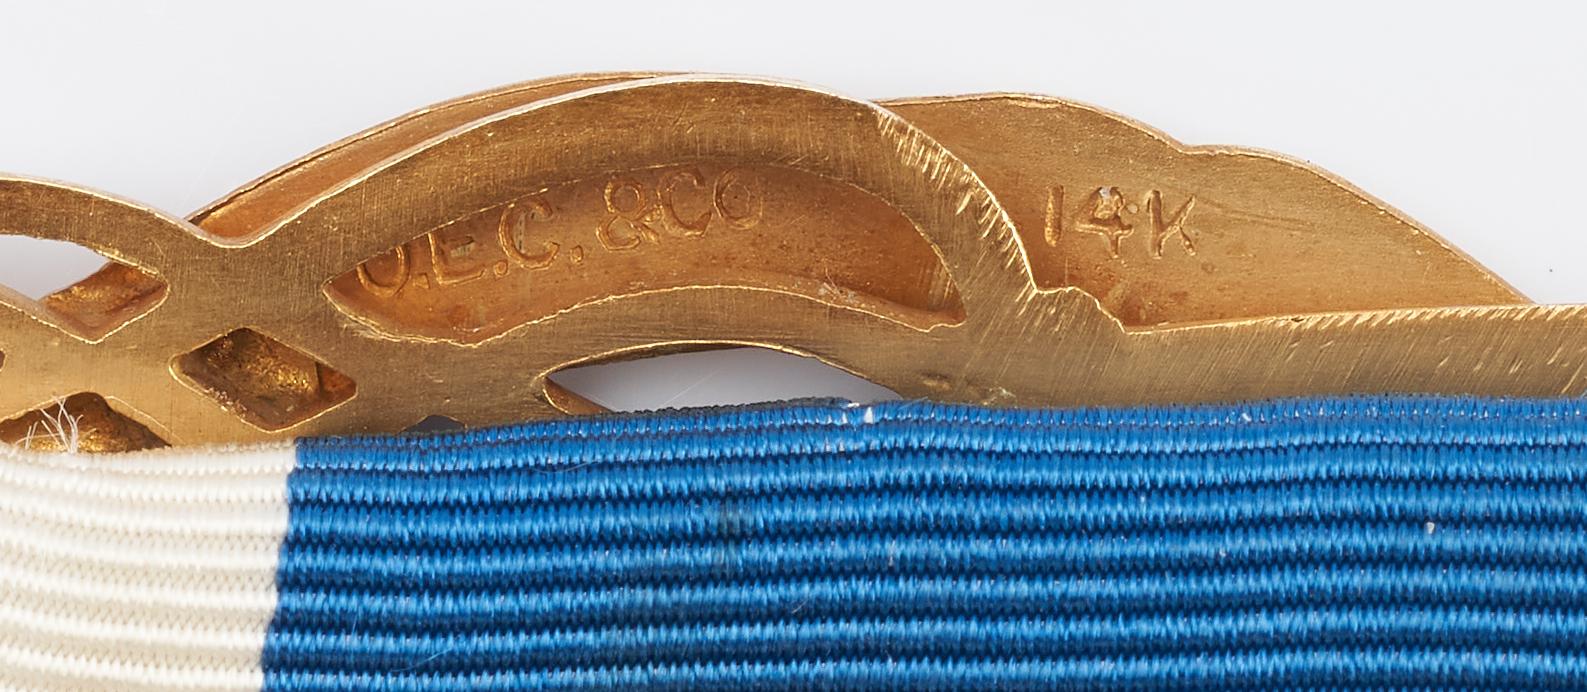 Lot 826: D.A.R. Ribbon w/ J.E. Caldwell Enameled Gold Badges